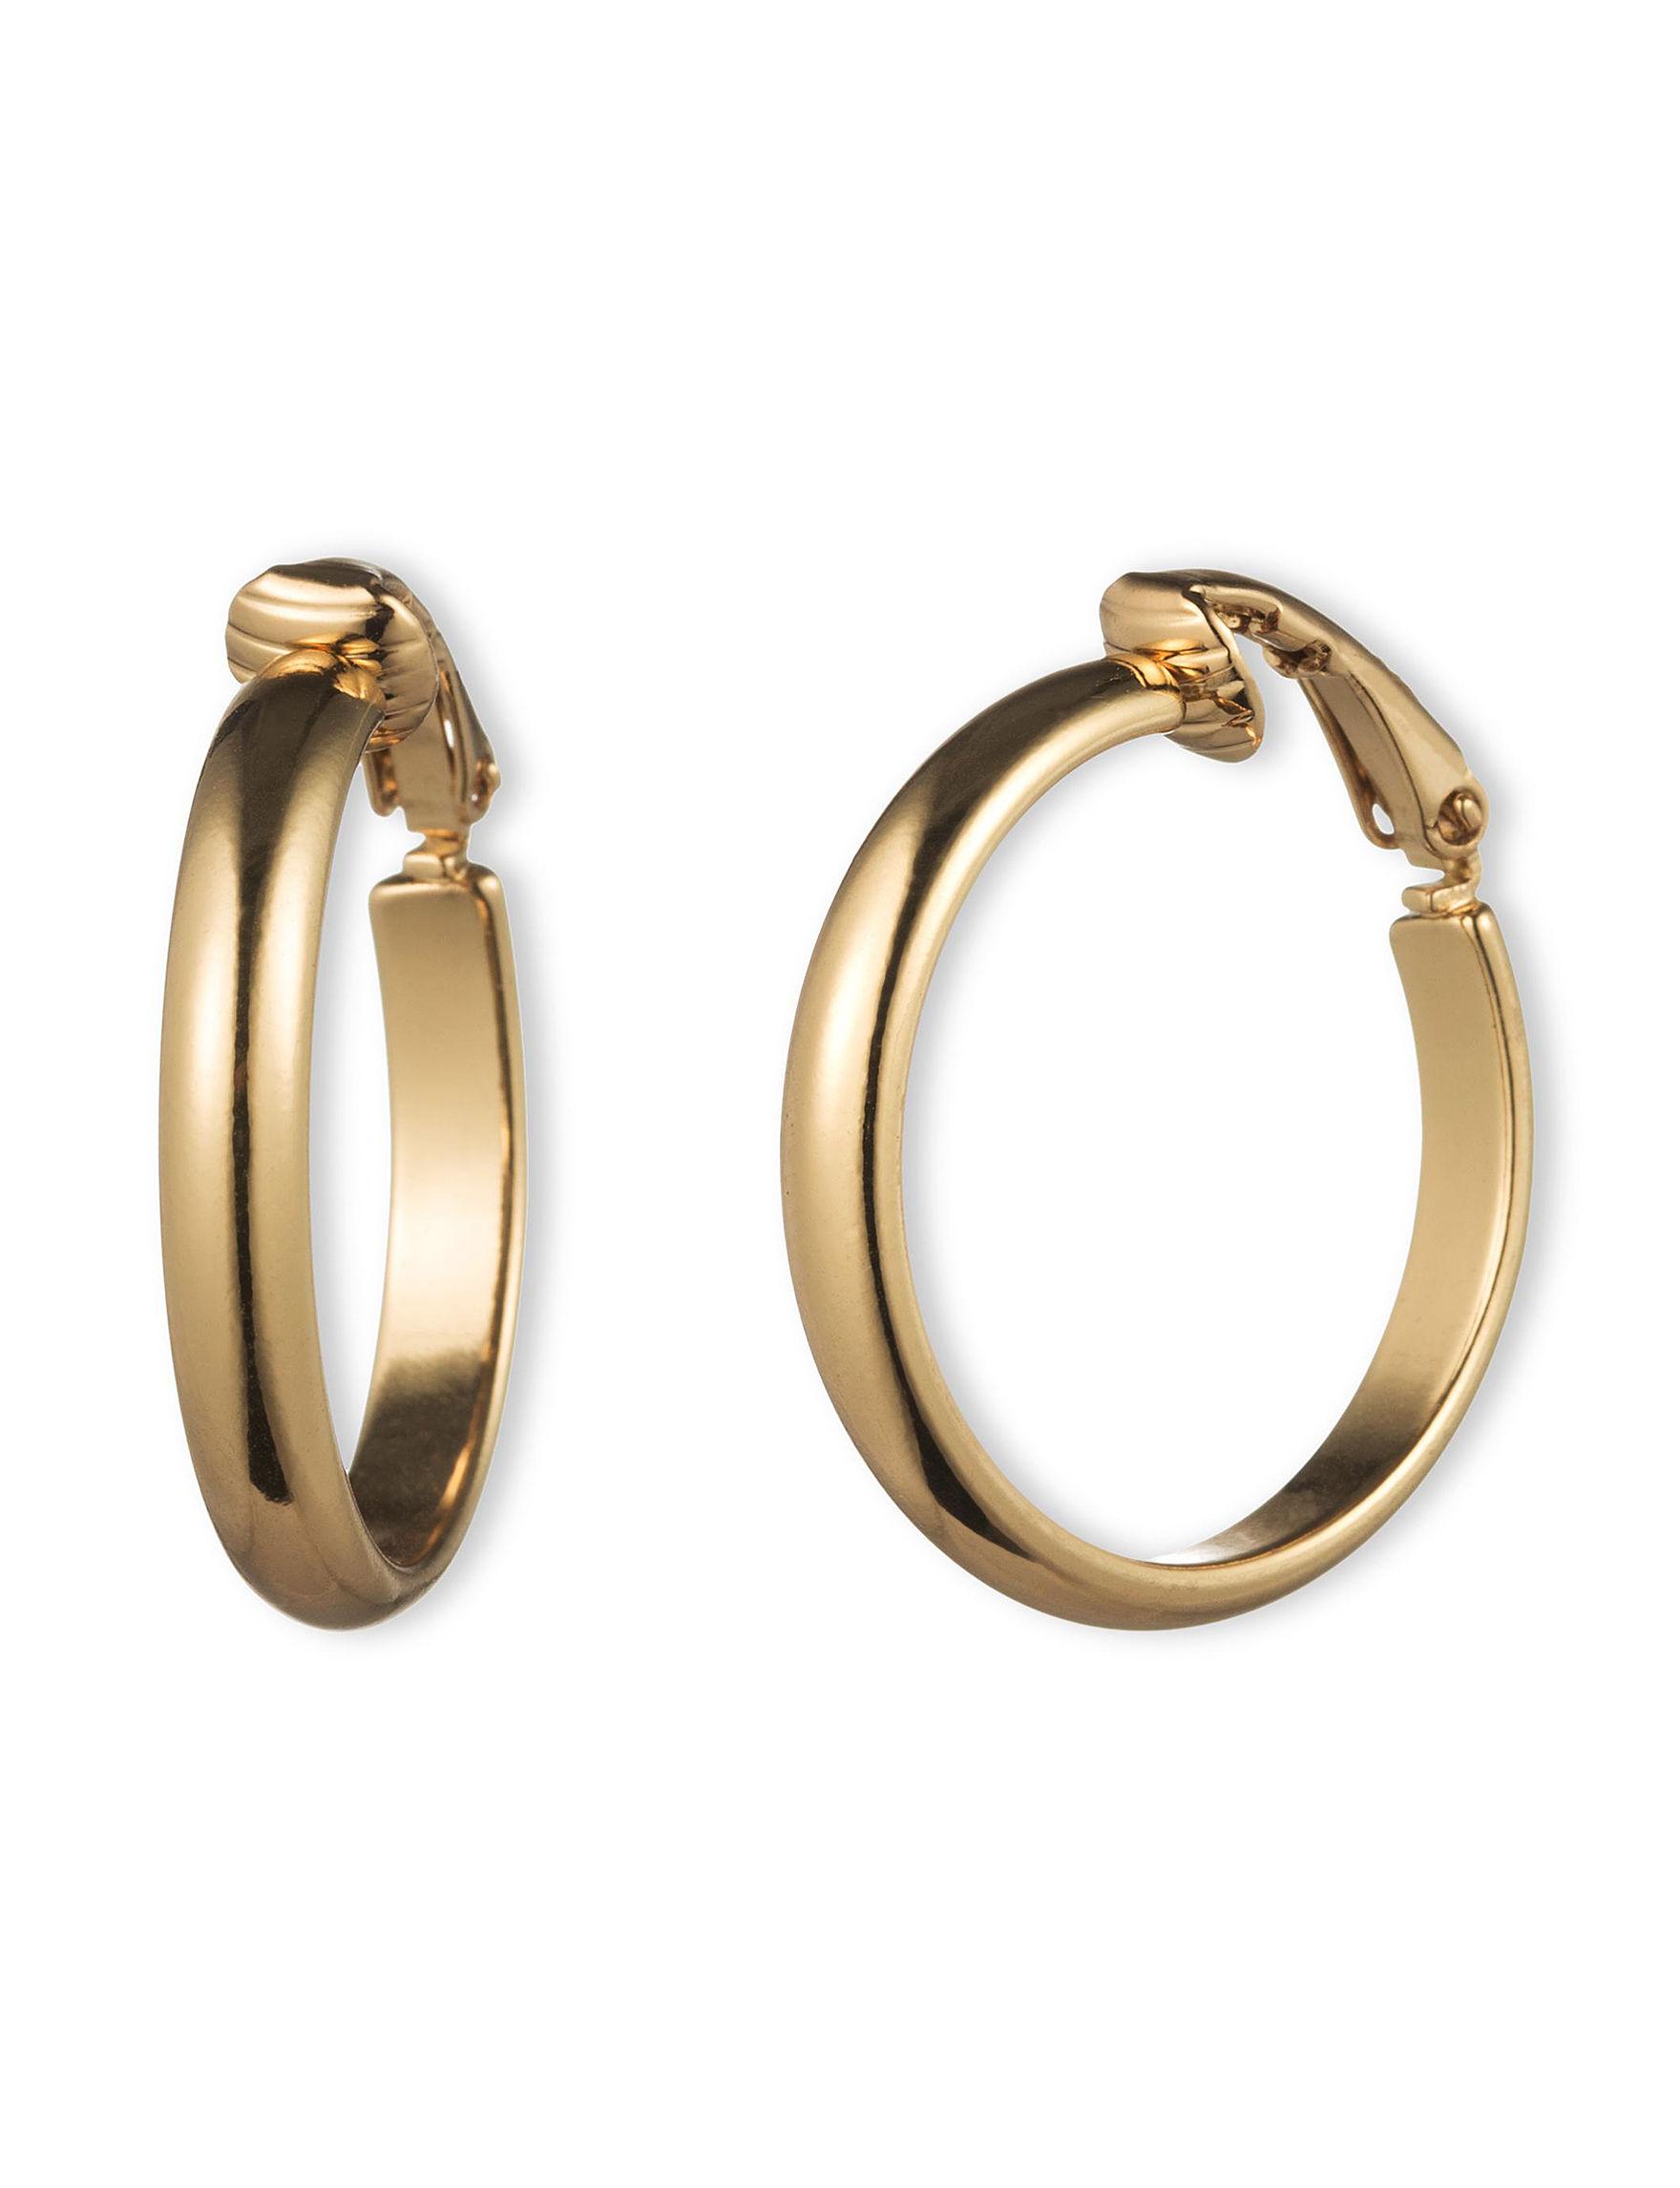 Gloria Vanderbilt Gold Hoops Earrings Fashion Jewelry